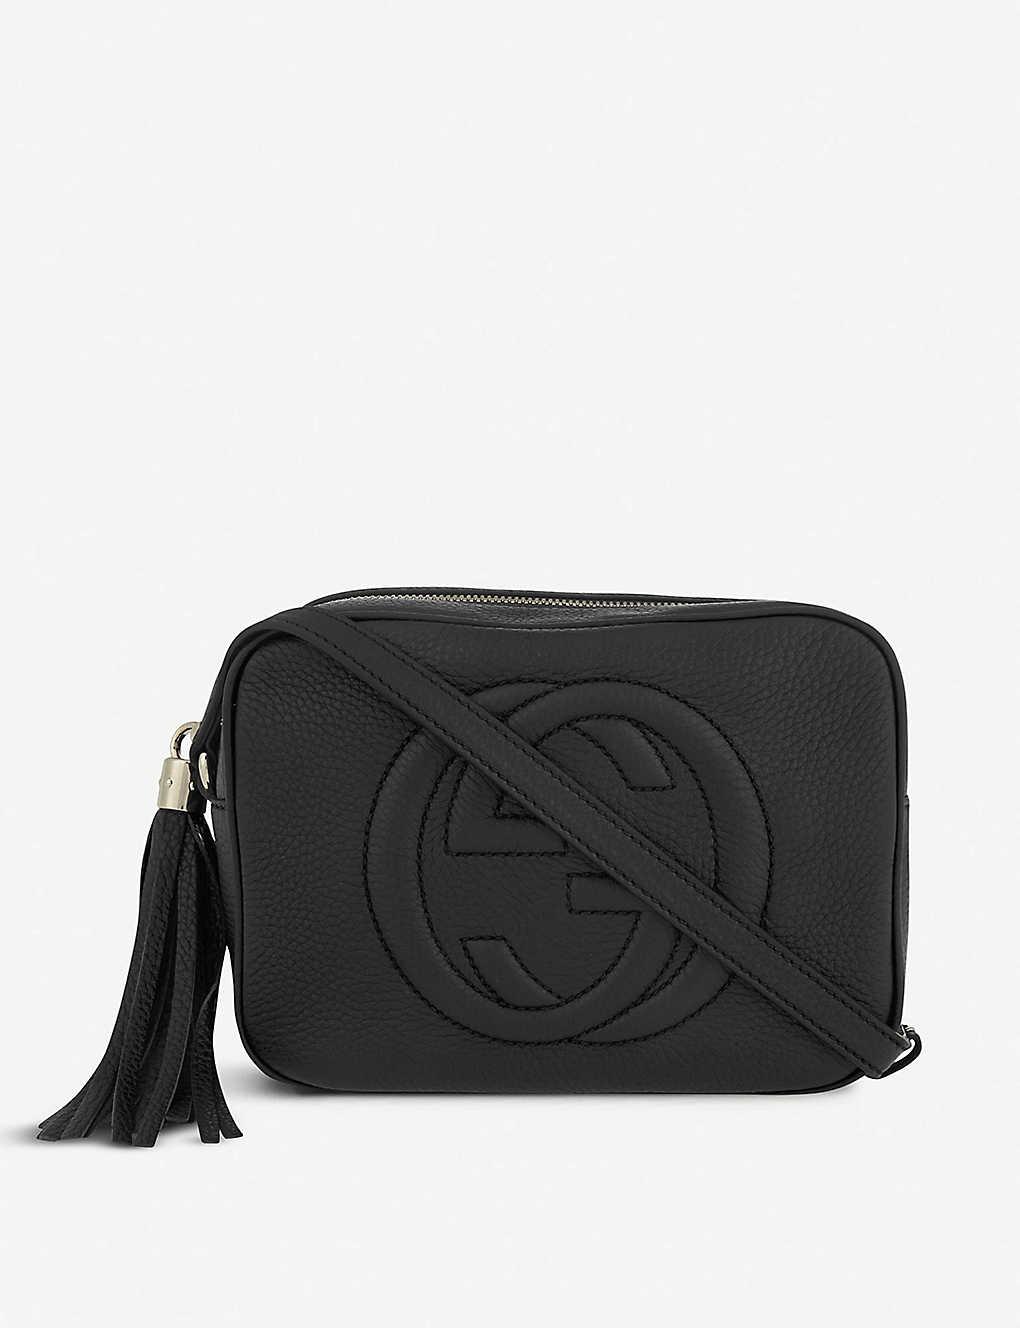 gucci bags black. no recent searches gucci bags black g